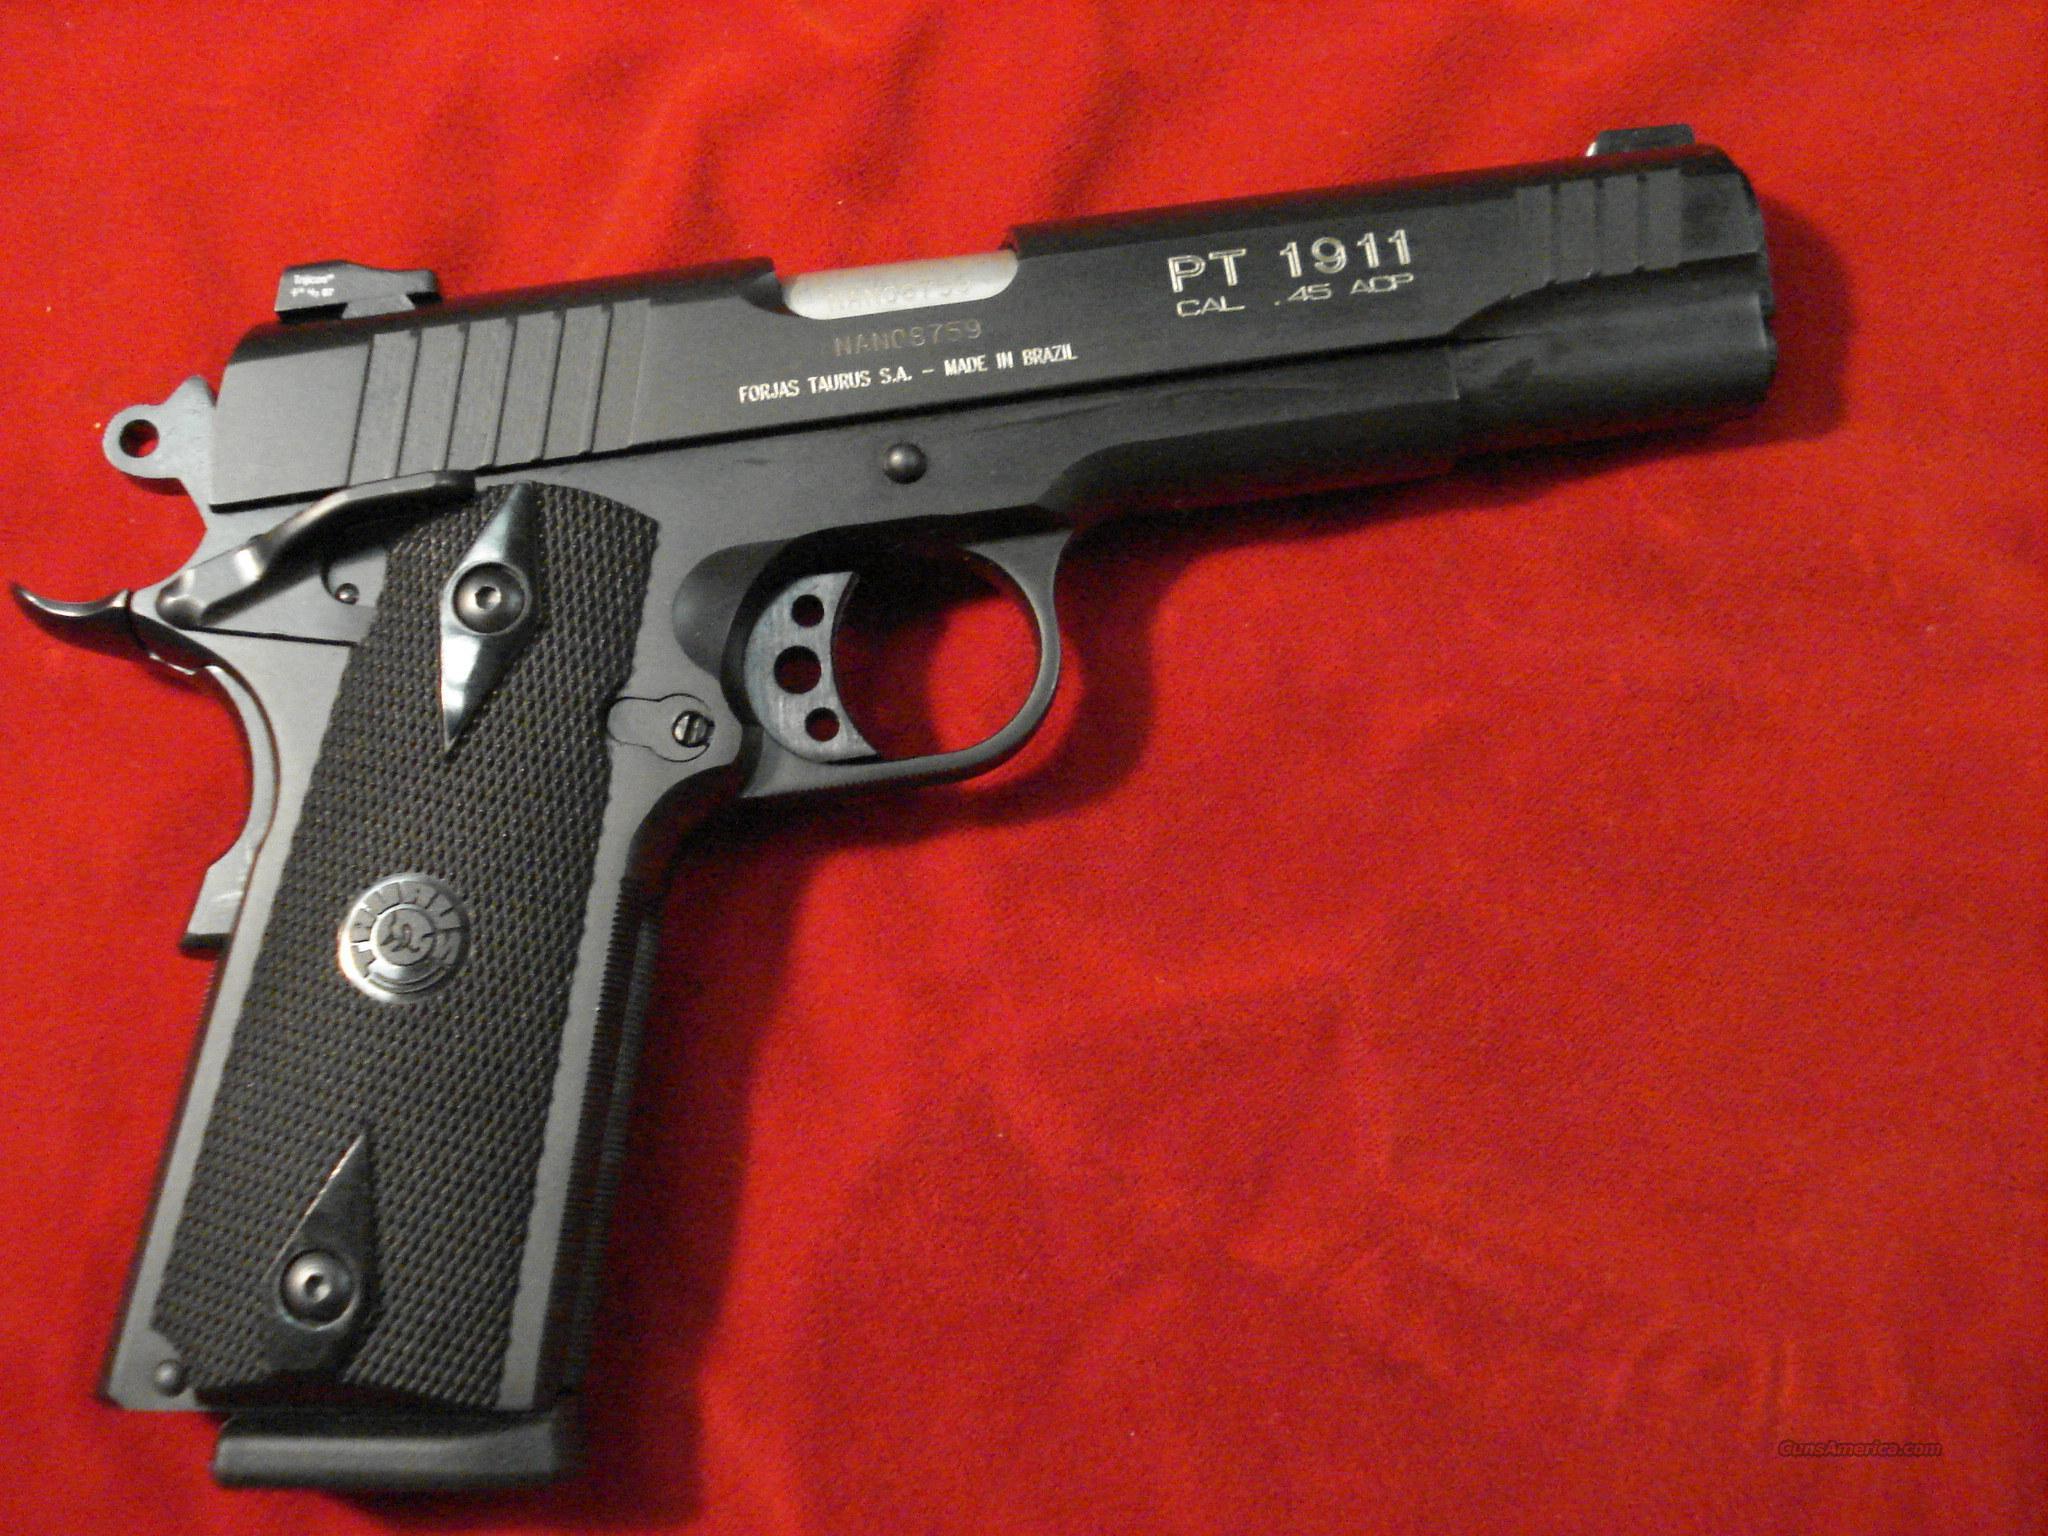 TAURUS NEW 1911B WITH TRIJICON NIGHT SIGHTS  Guns > Pistols > Taurus Pistols/Revolvers > Pistols > Steel Frame